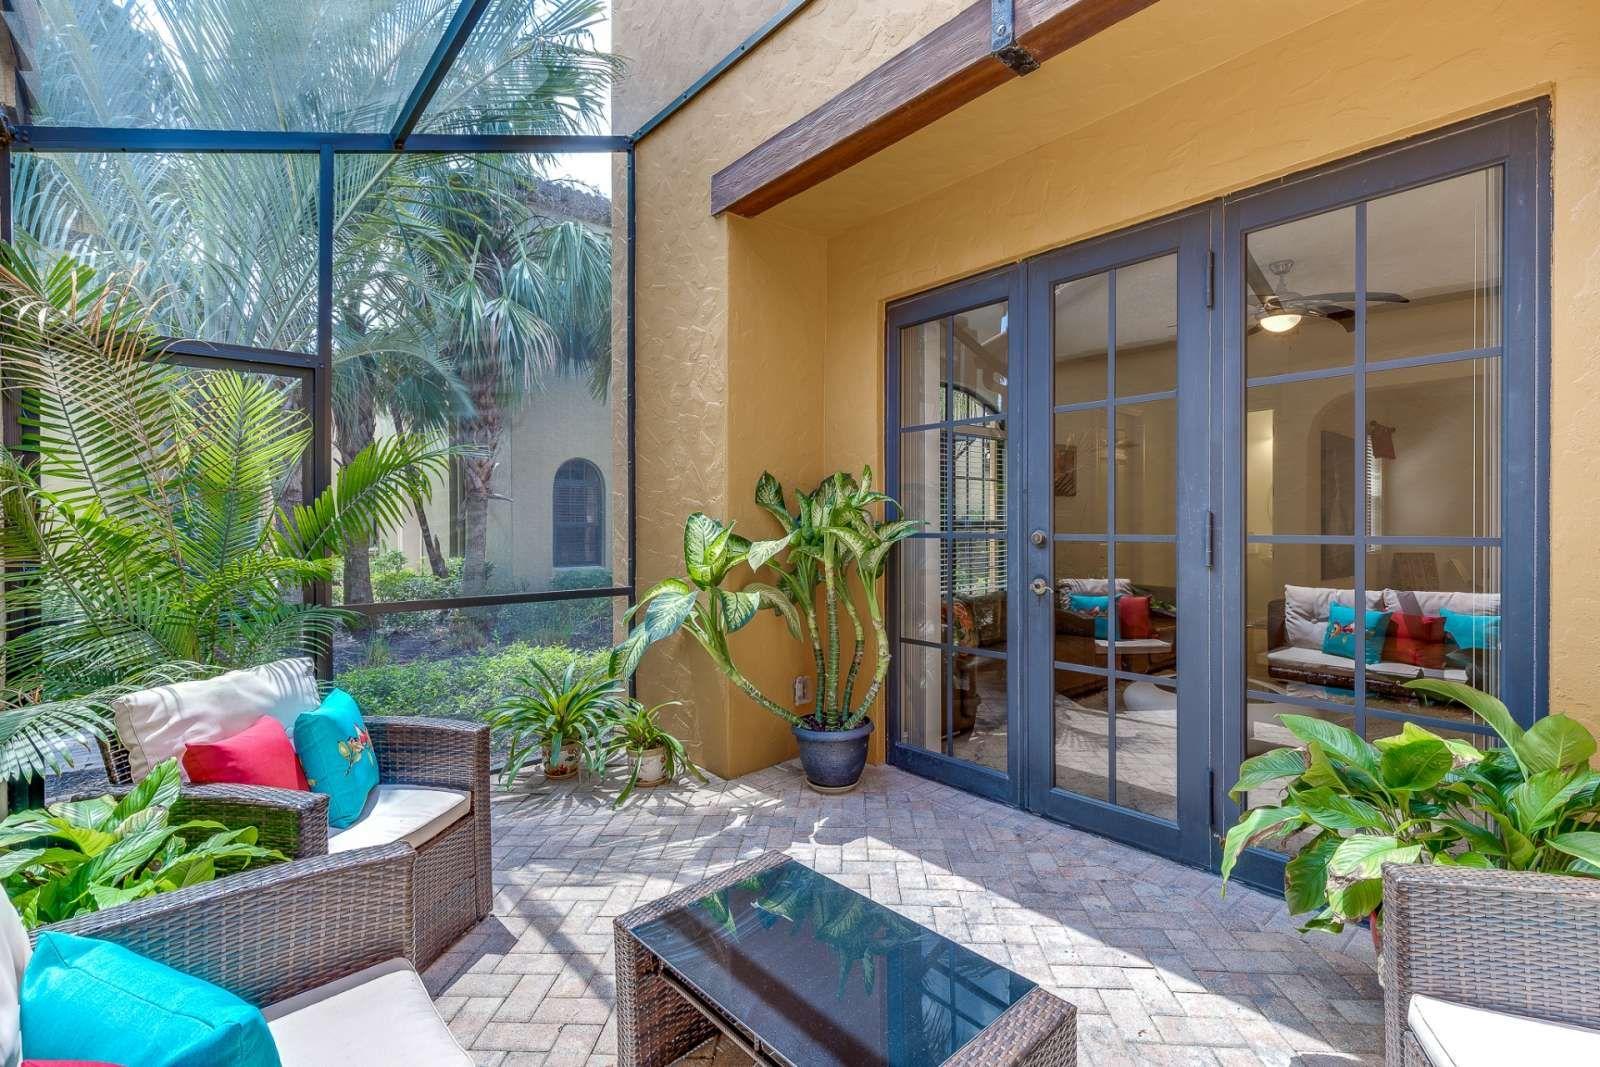 Fort myers vacation rental enjoy a stunning resort